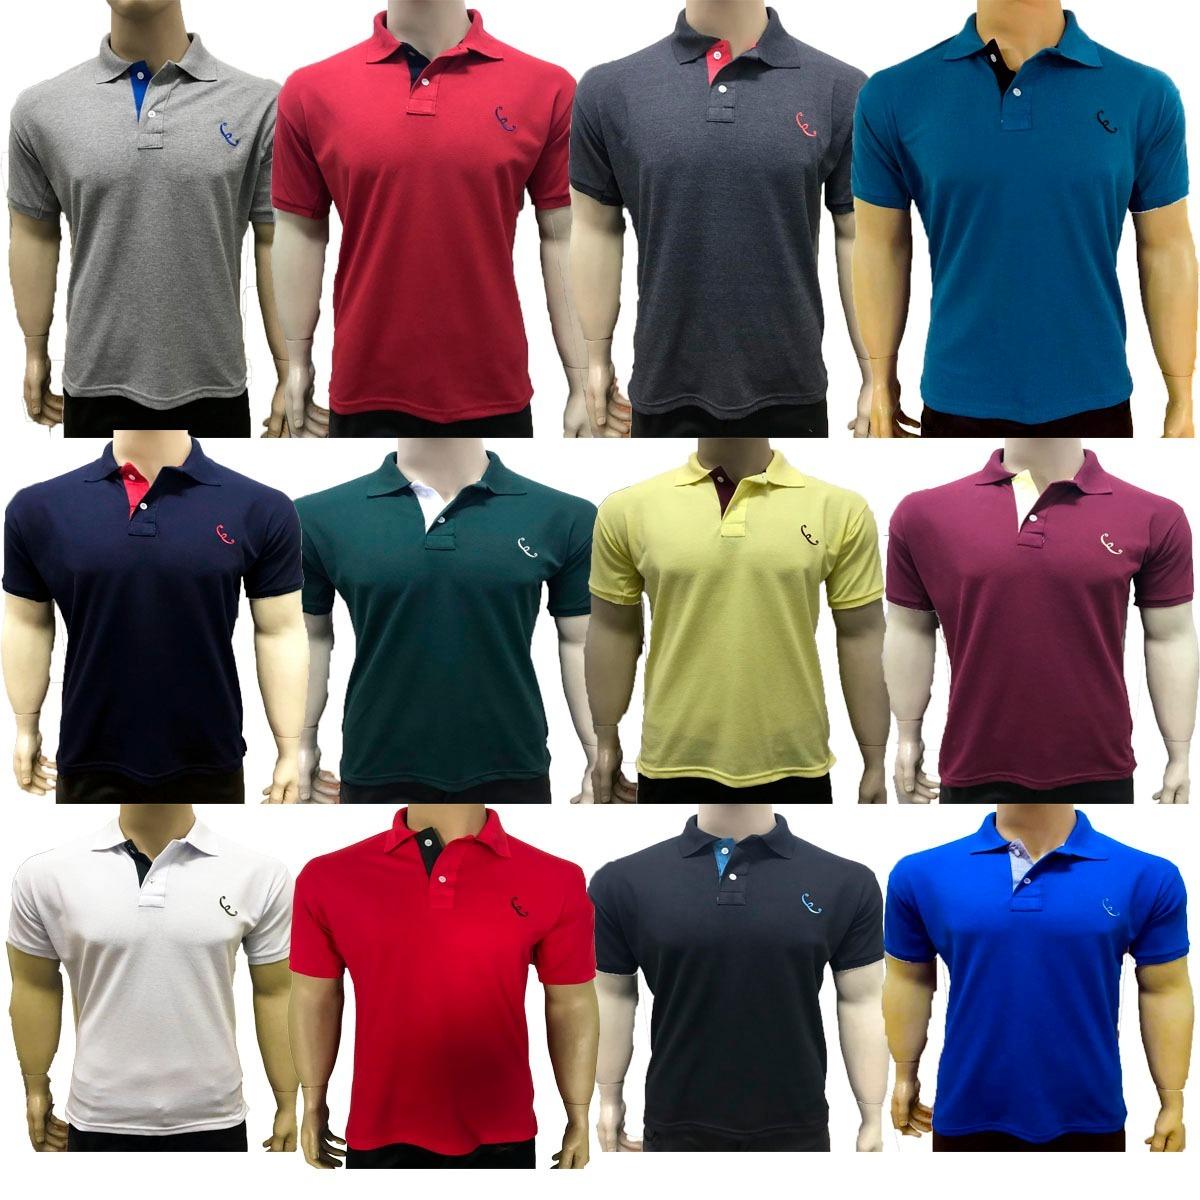 Kit 10 Camisa Polo   Frete Grátis   Camiseta Polo Atacado - R  178 ... c52360bf737a6